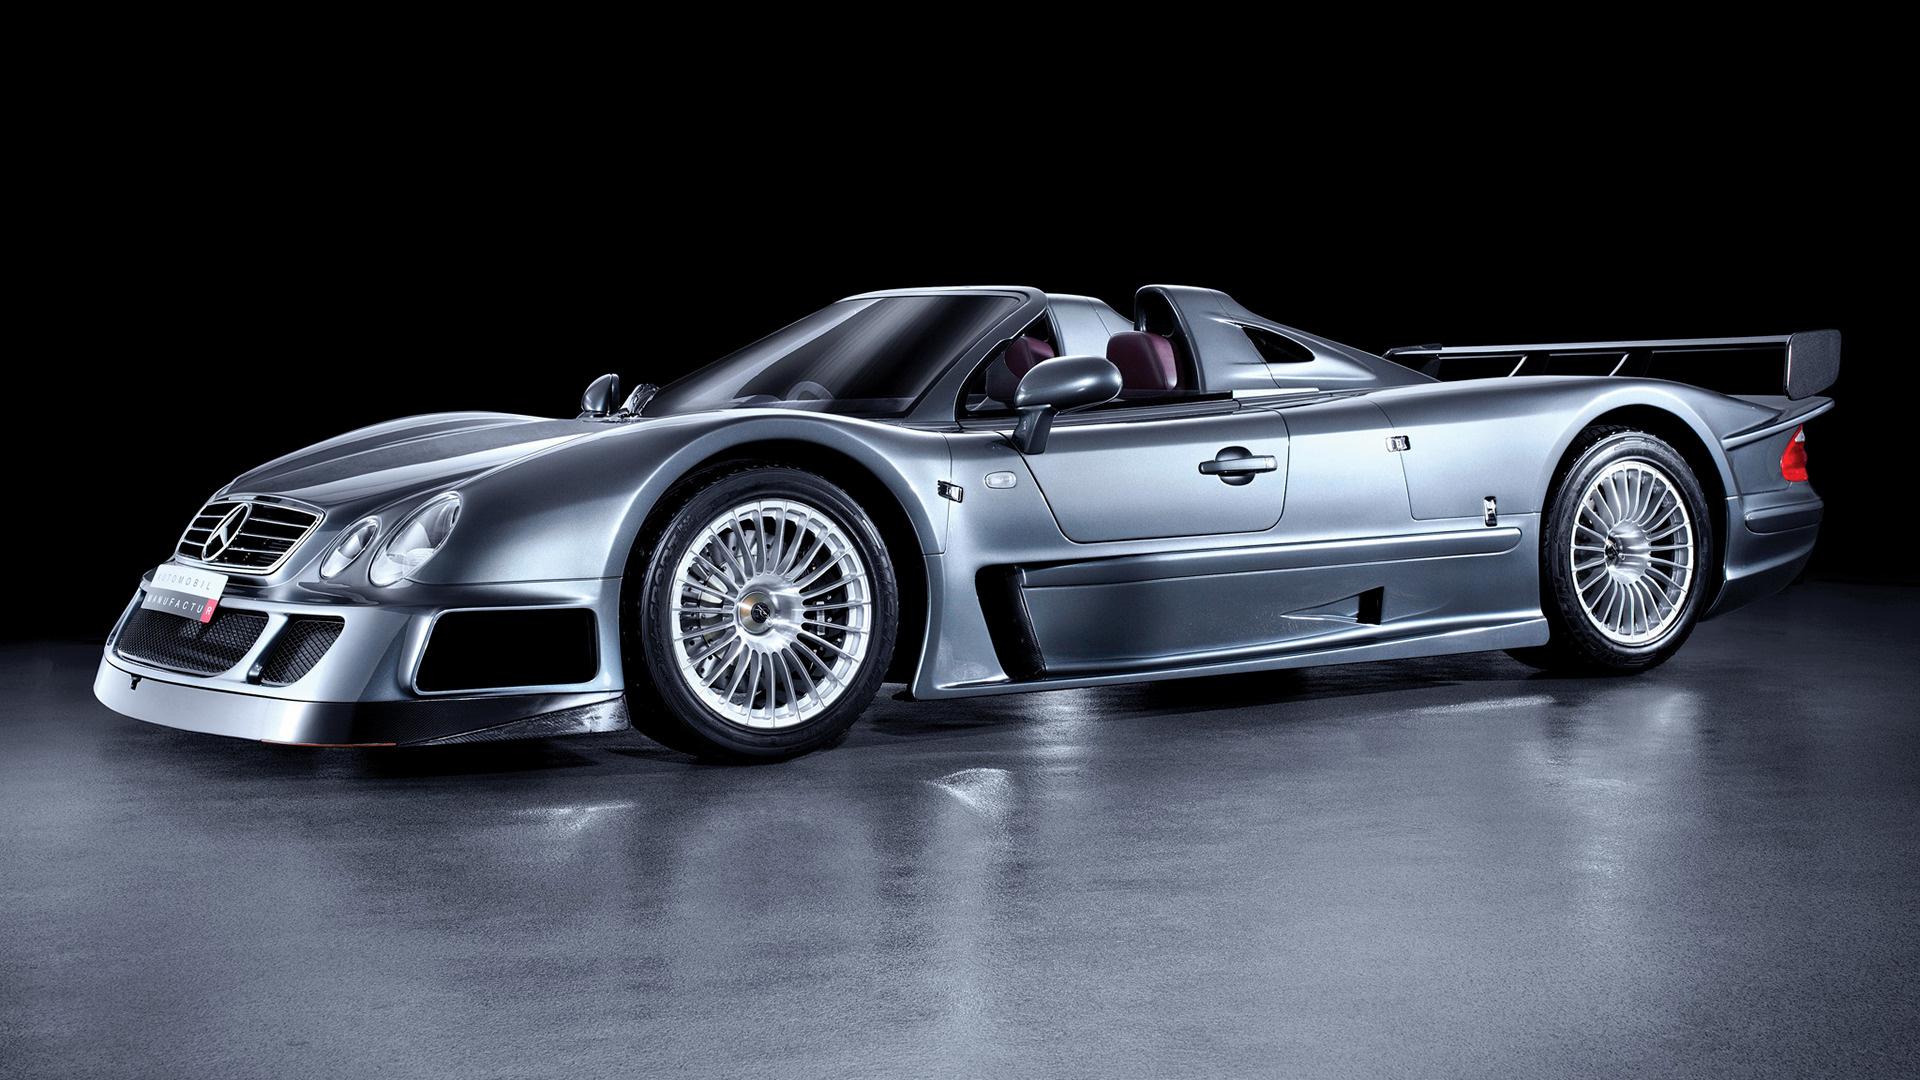 2006 Mercedes-Benz CLK GTR Roadster RHD - Wallpapers and ...